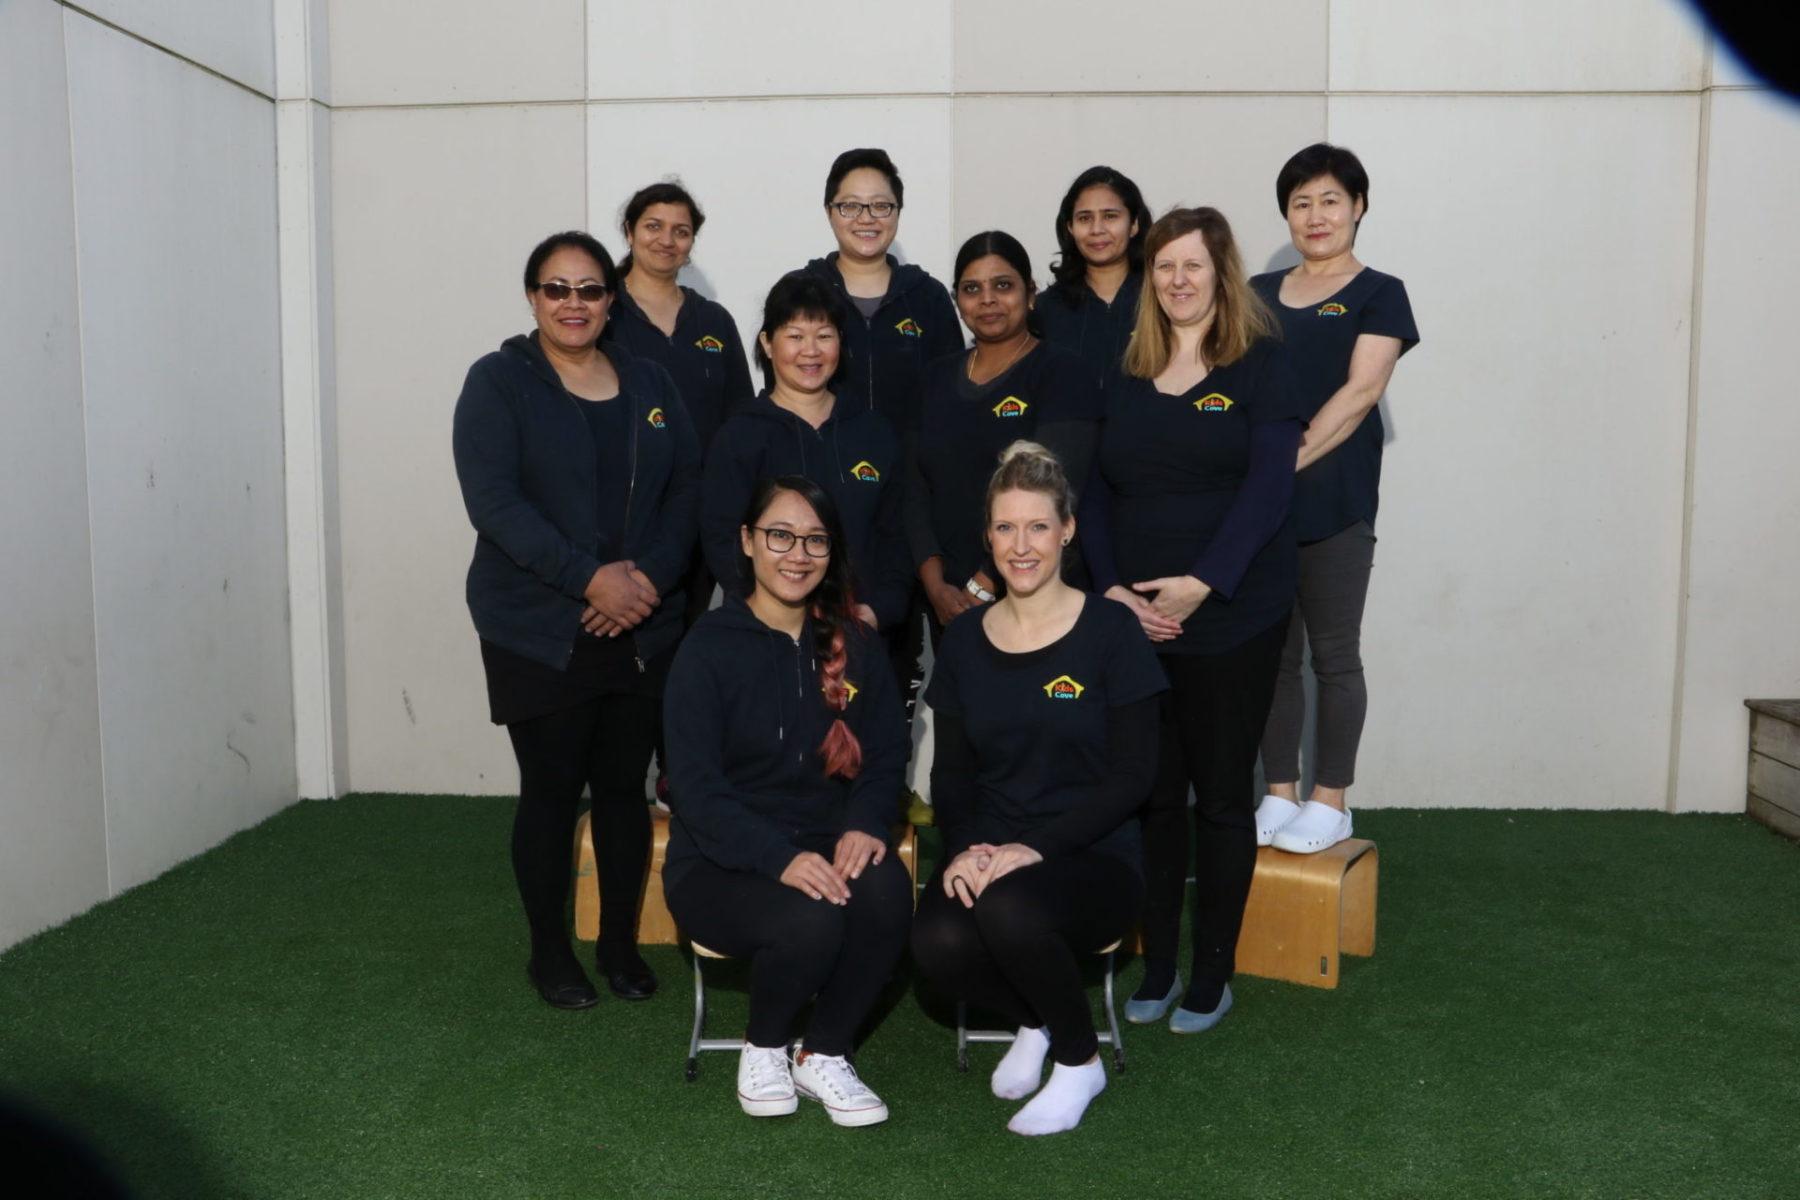 Newmarket Daycare Team